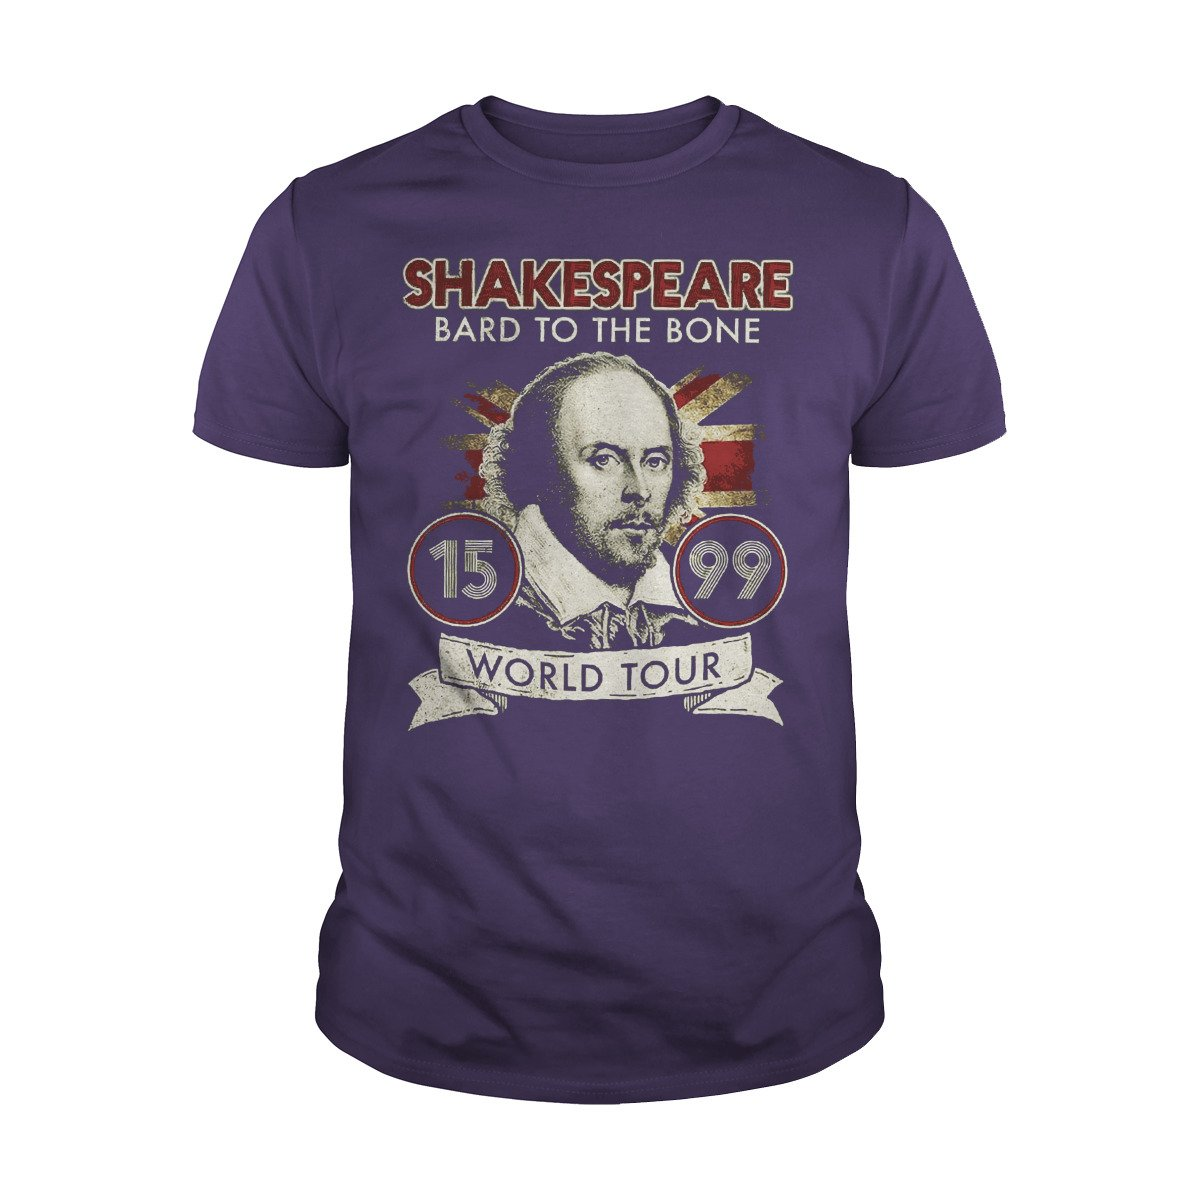 William Shakespeare Bard To The Bone Shirts